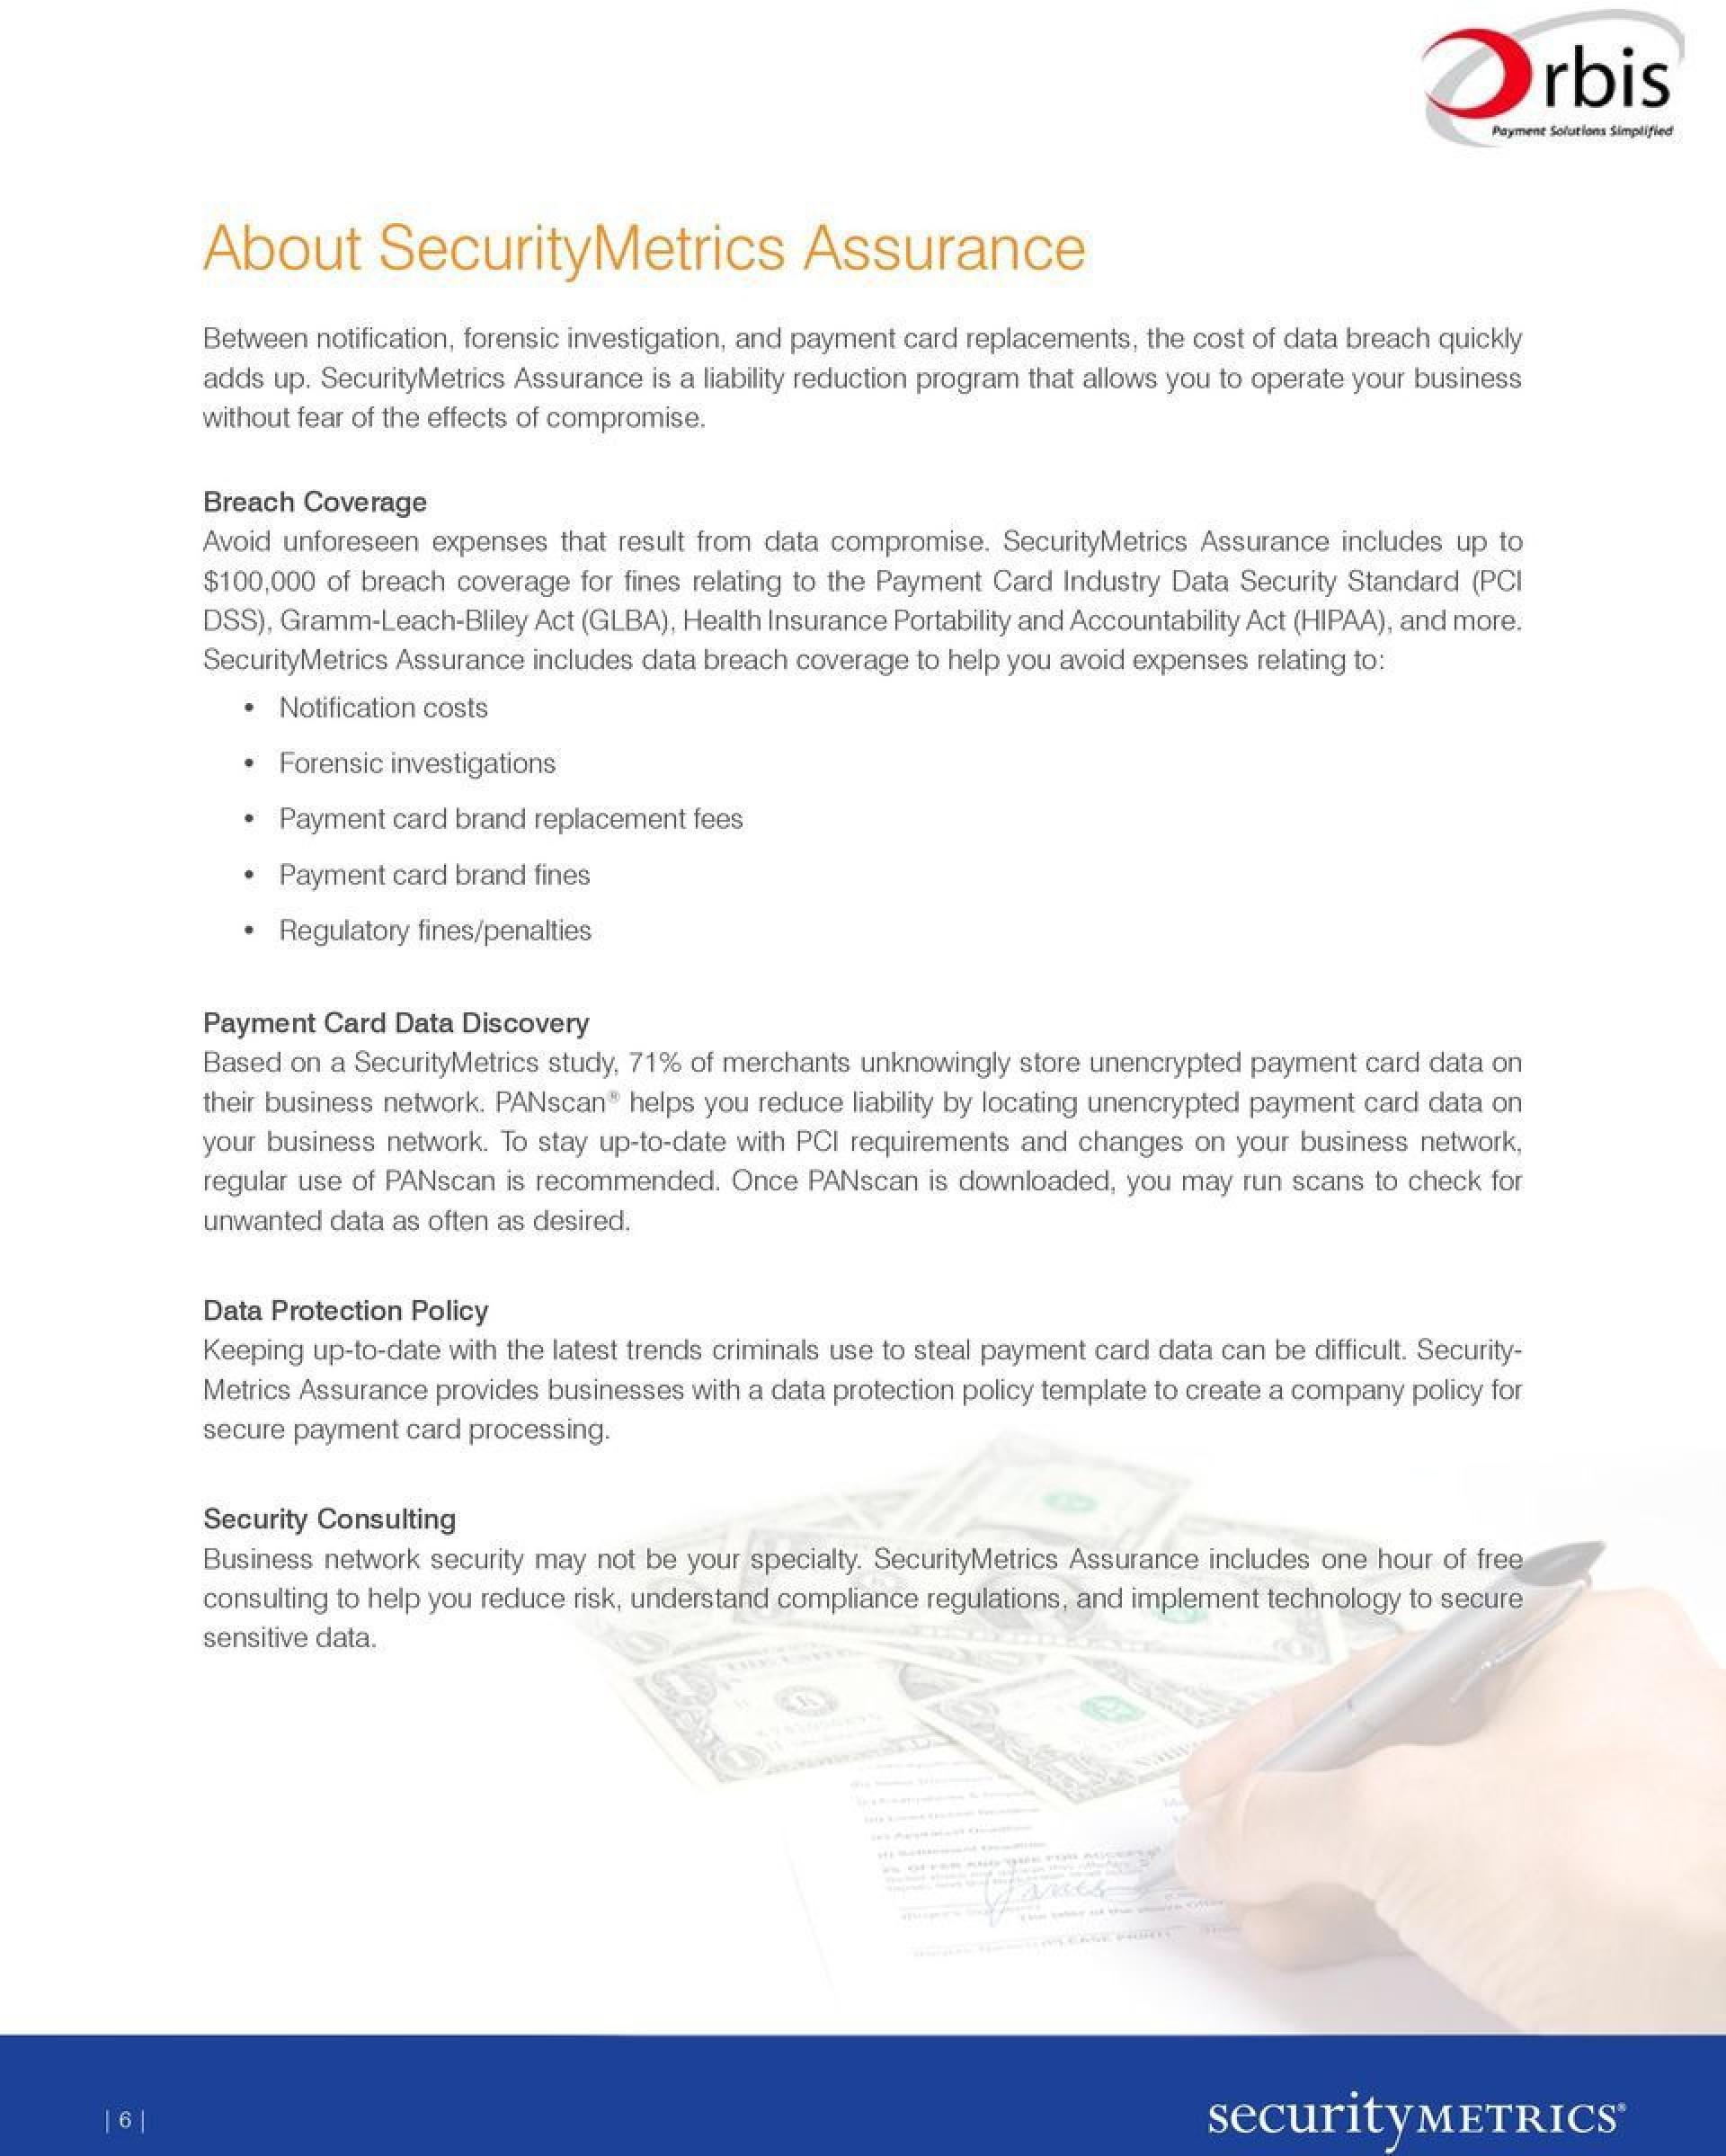 002 Wondrou Data Security Policy Template Example  Uk Center Gdpr1920